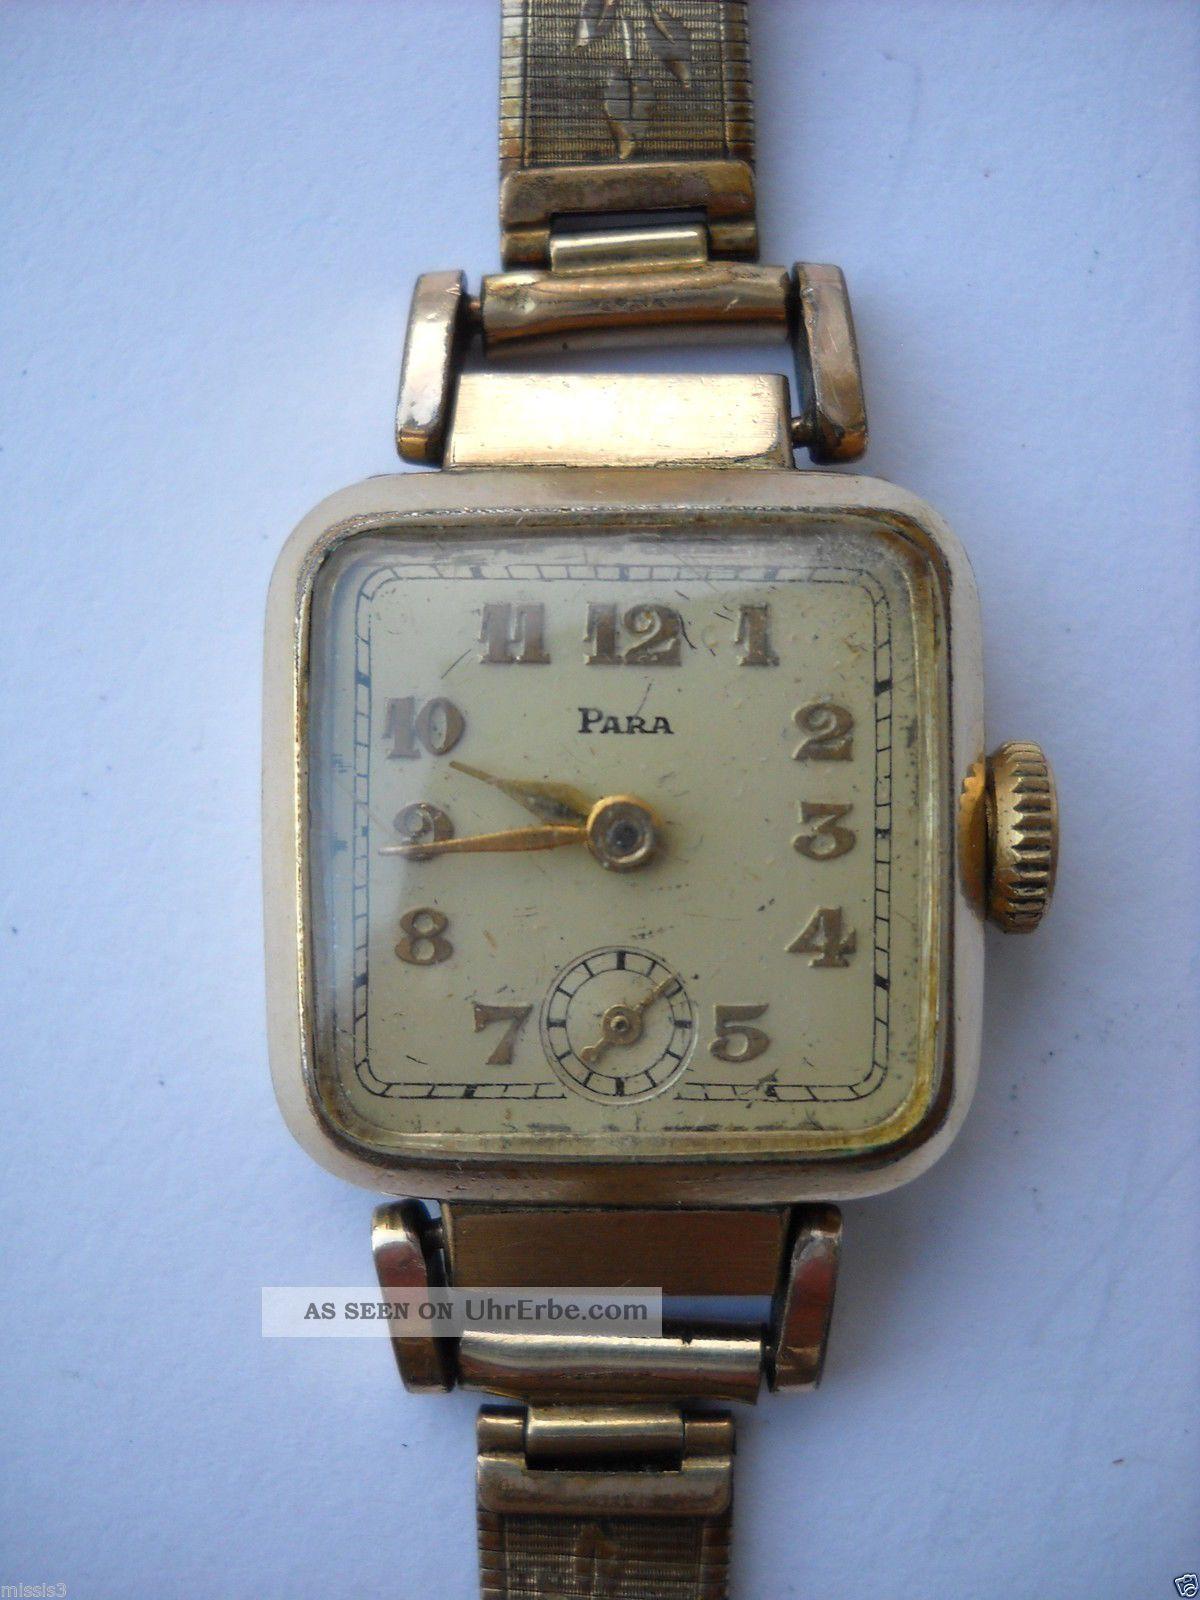 Para,  Damen,  Armbanduhr,  Handaufzug,  Vergoldet,  Kaliber 810 (urofa 522),  30er Jahre Armbanduhren Bild